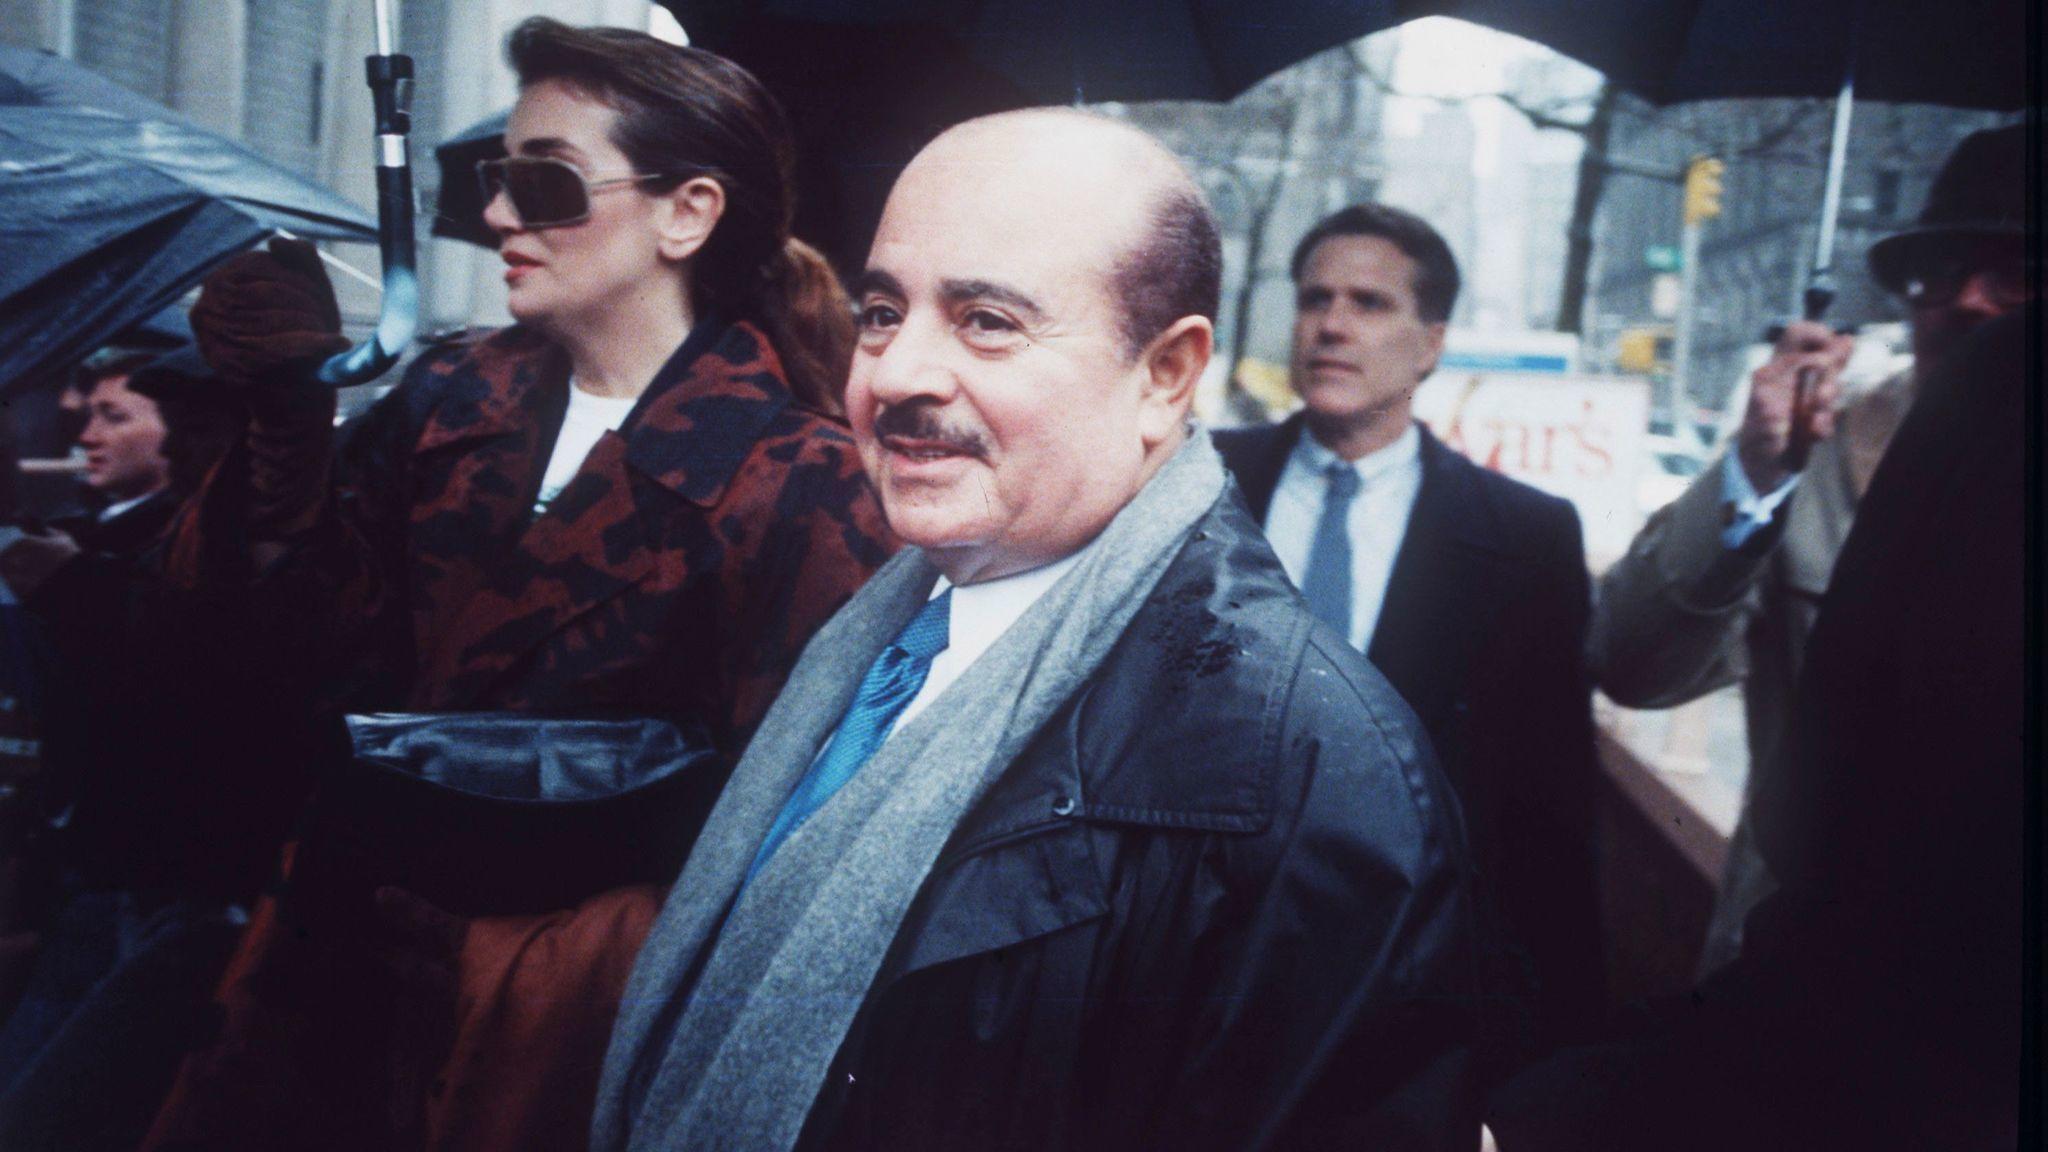 adnan khashoggi wealthy arms dealer and irancontra